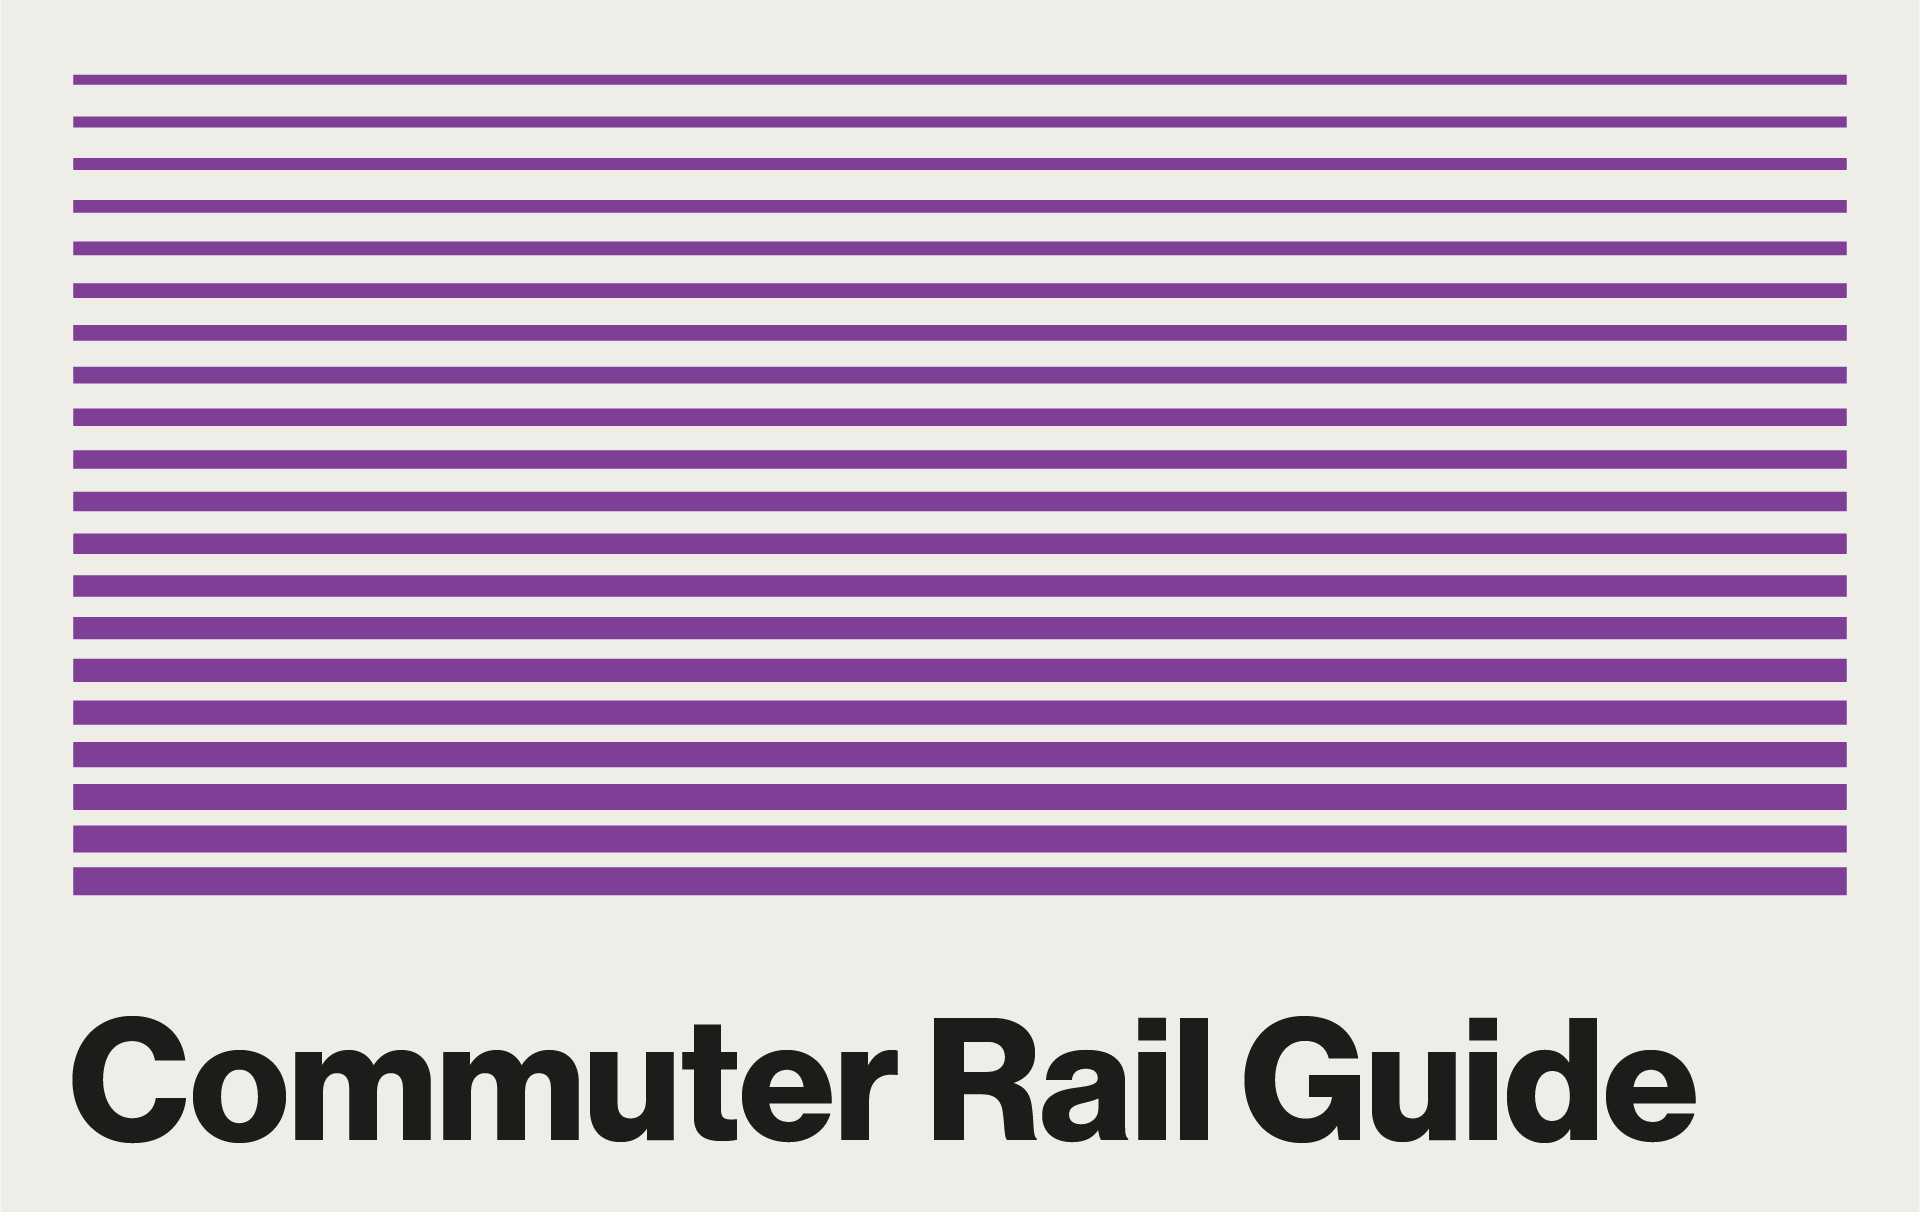 Commuter Rail Guide Clickable Graphic